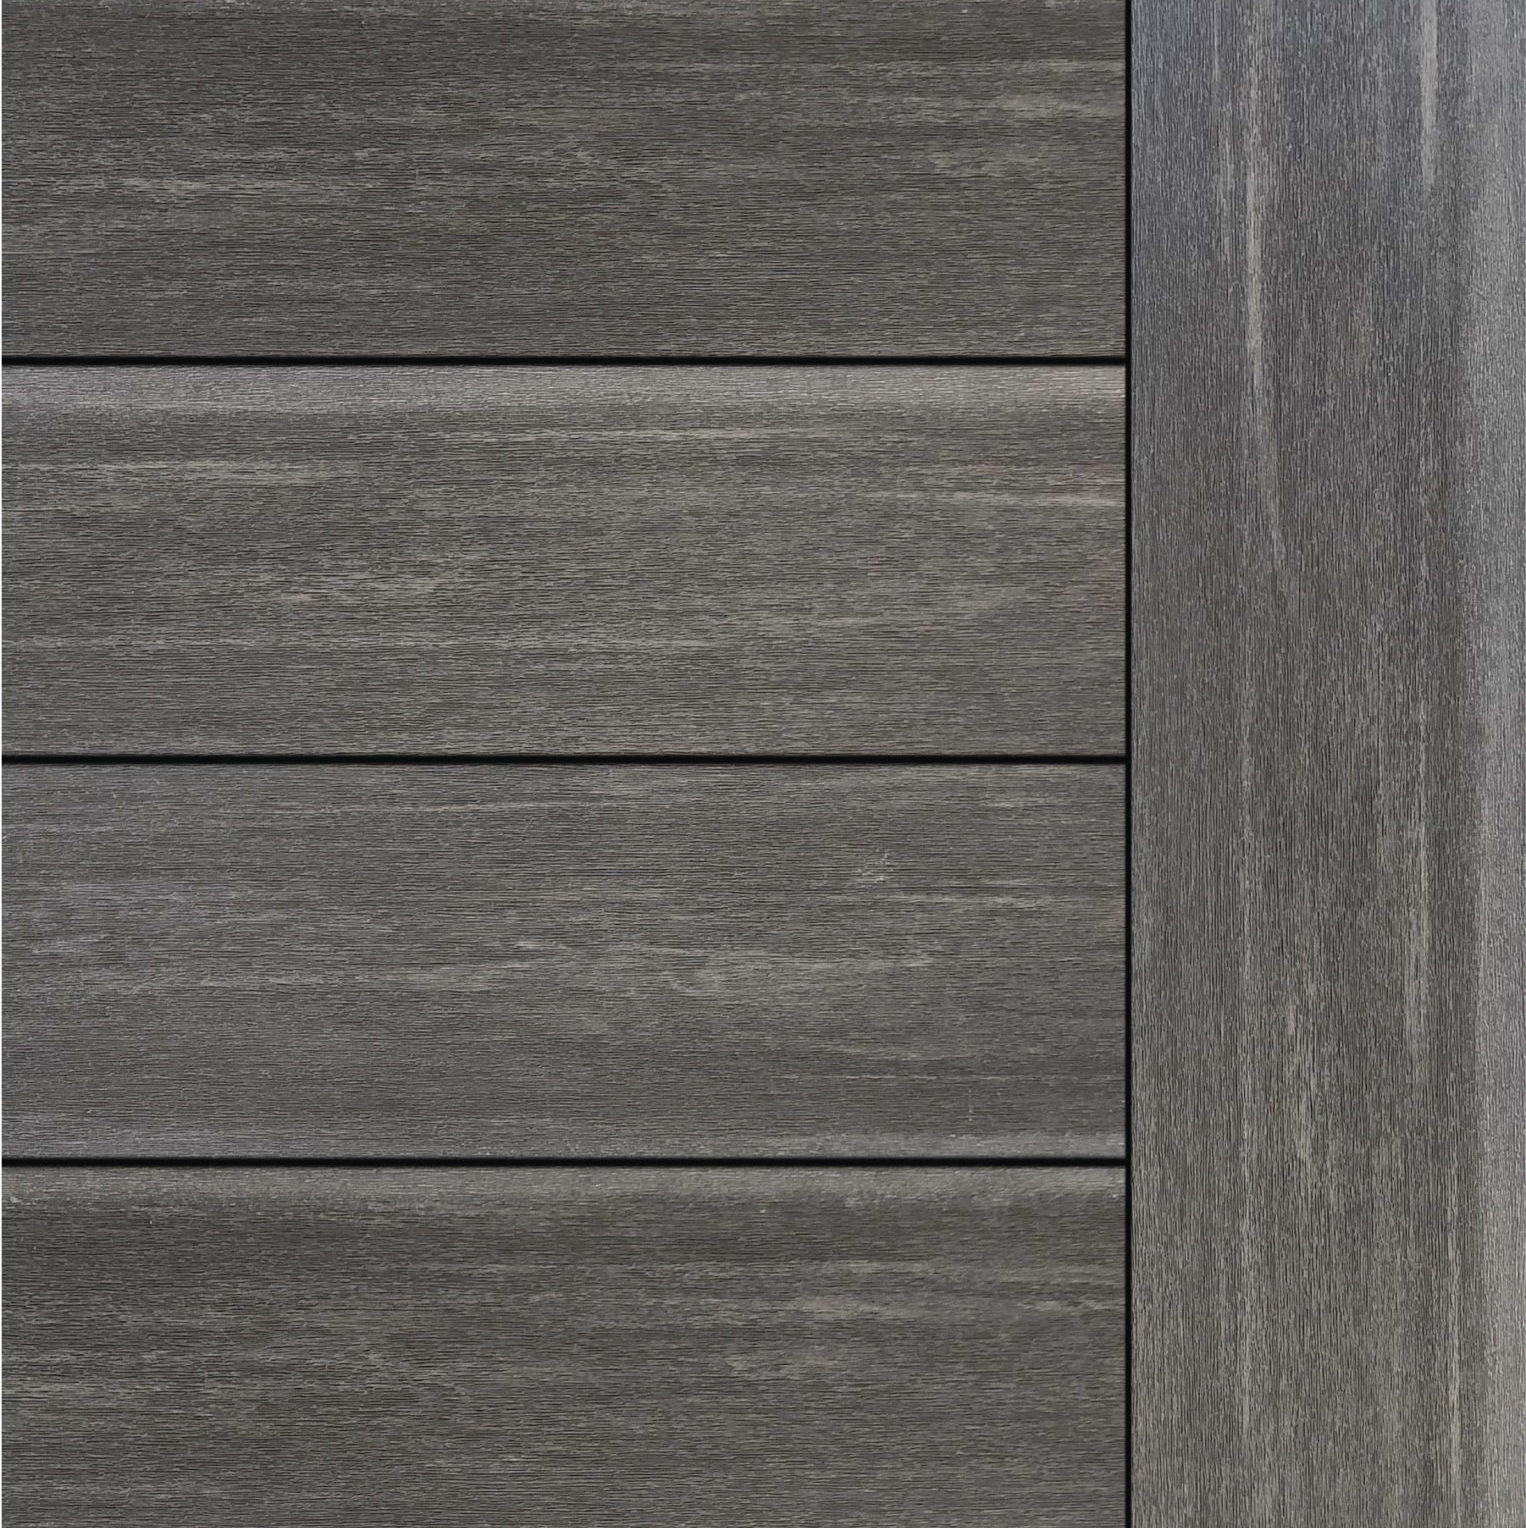 azek dark hickory deck